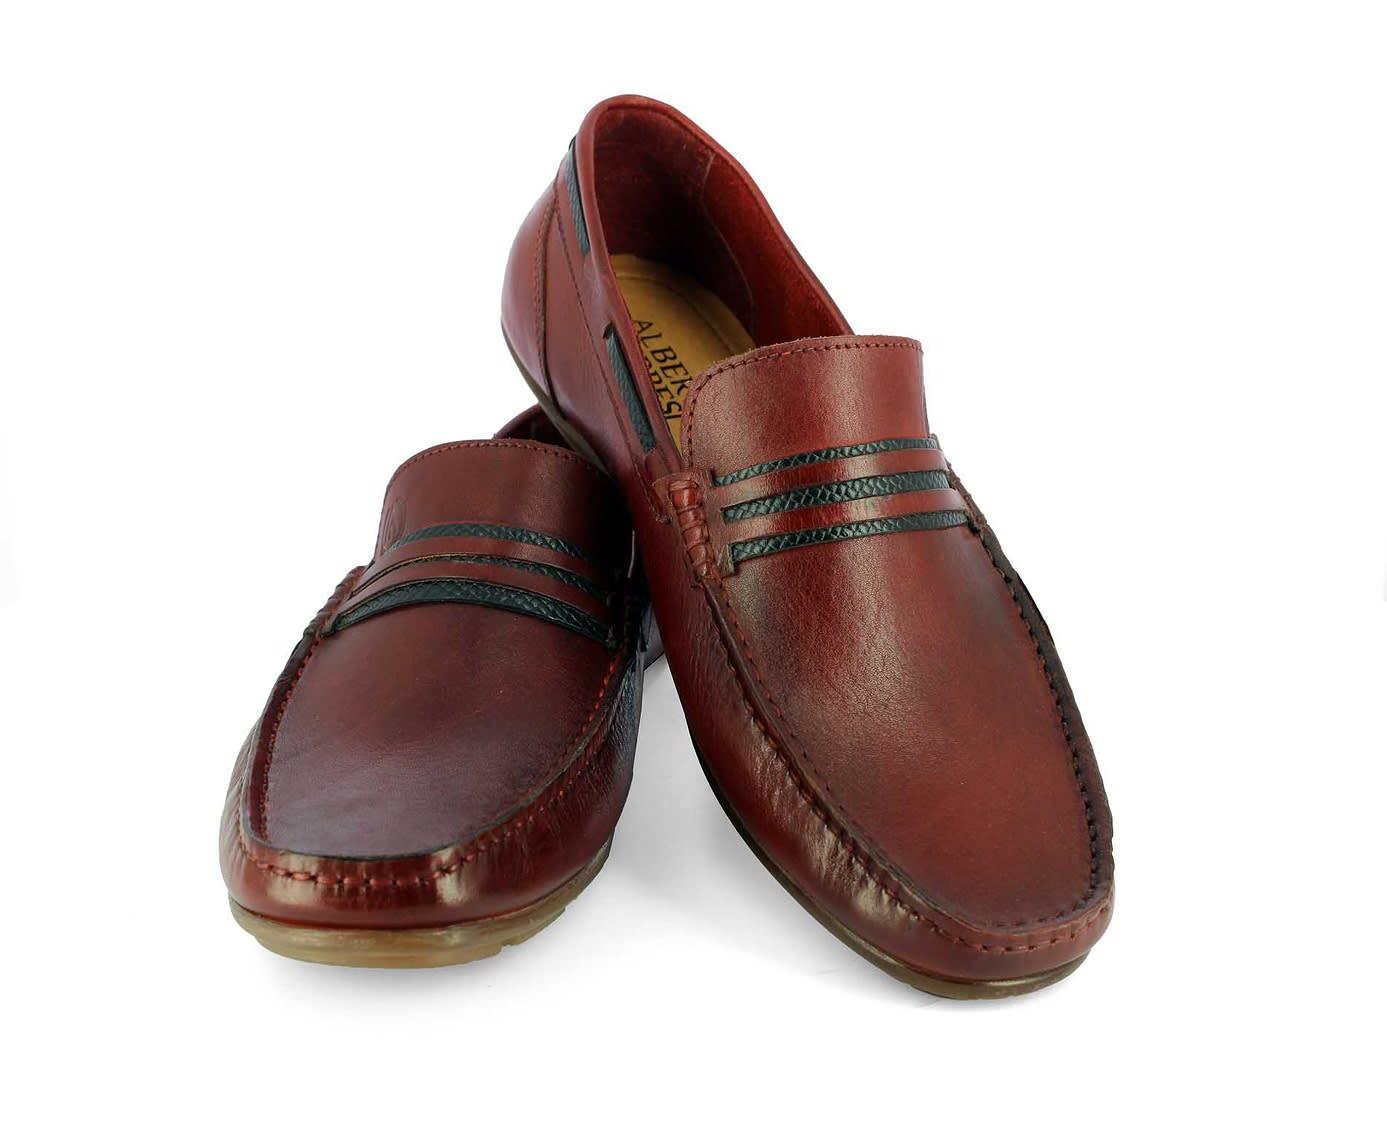 alberto-torresi-tenerife-burgandy-casual-shoes-price-rs-2995